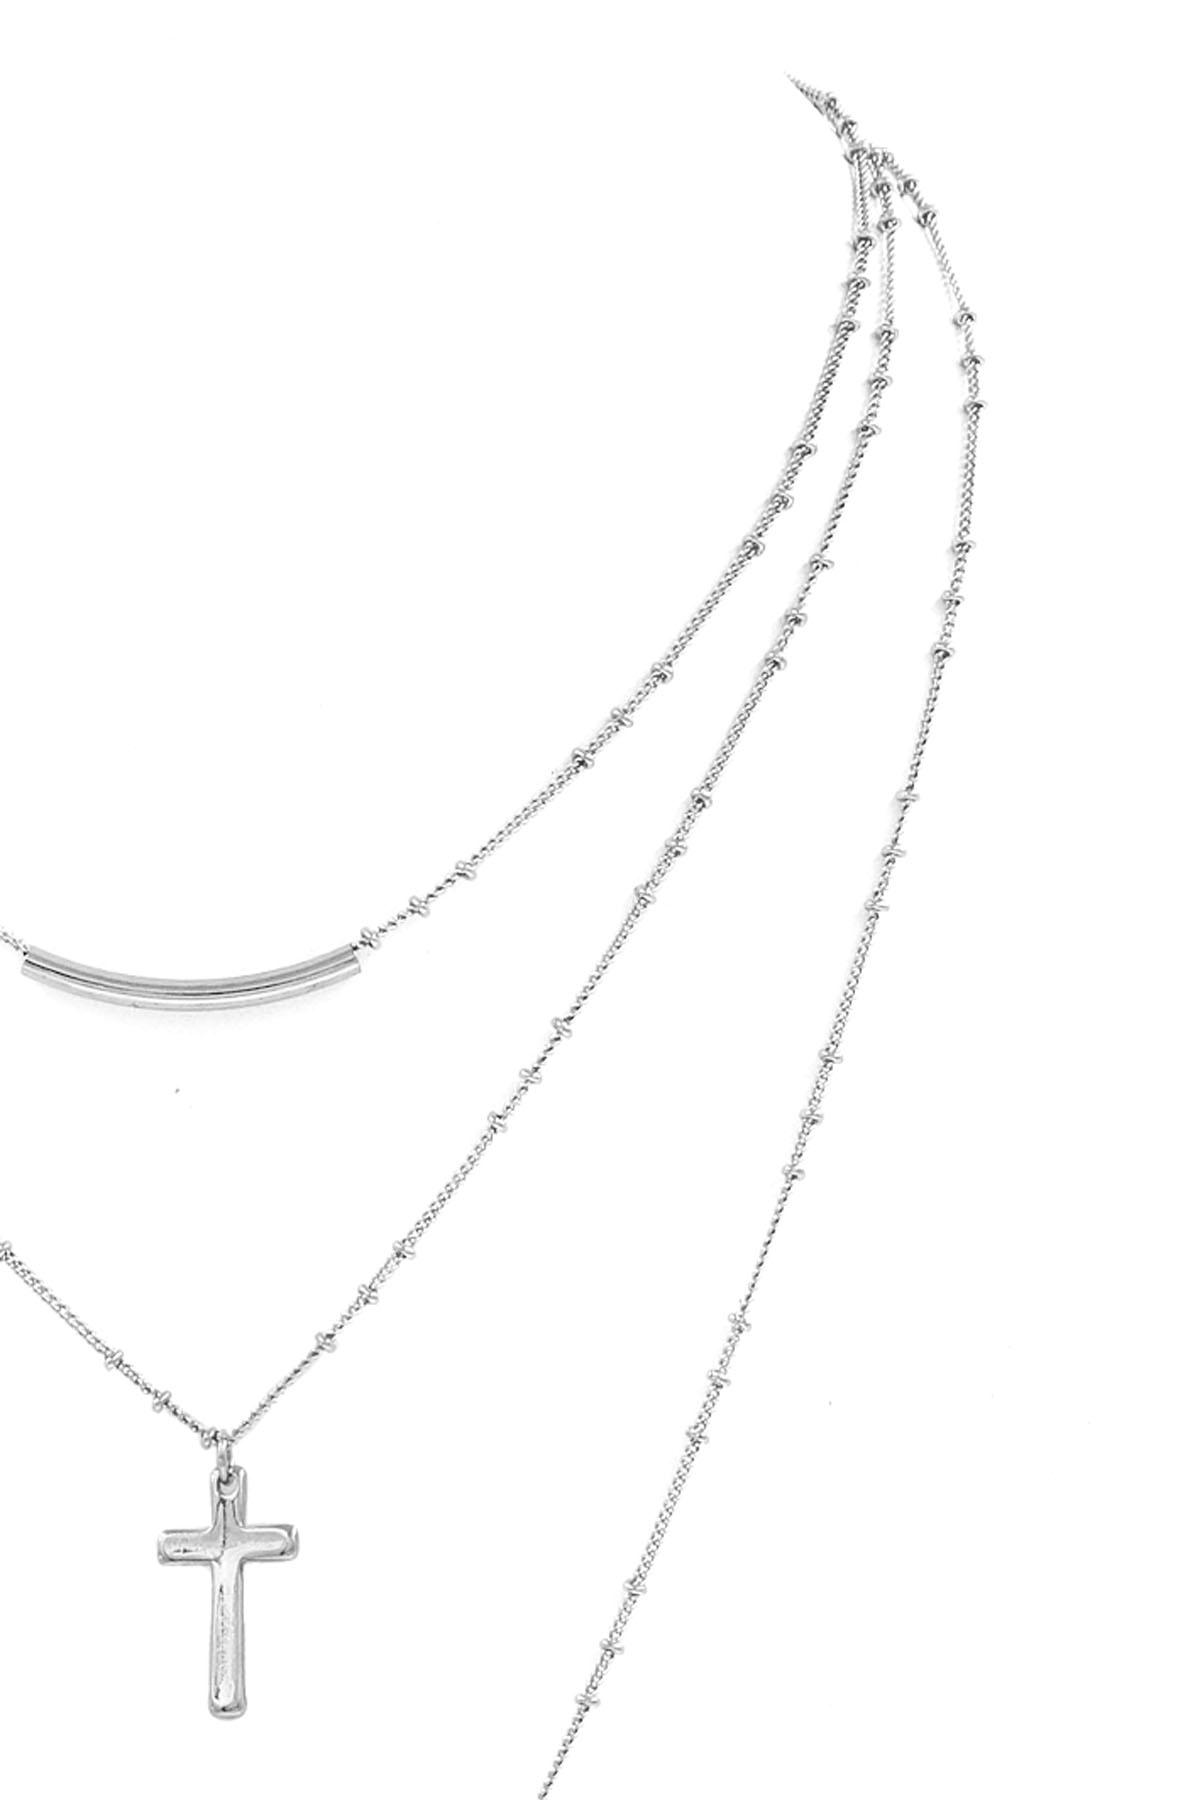 Layered Cross//Circle Charm Necklace Set